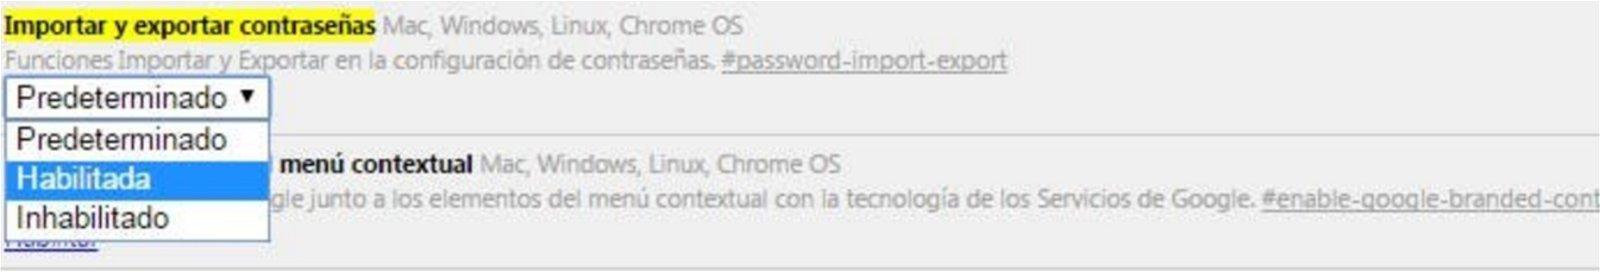 Exportar pwd chrome